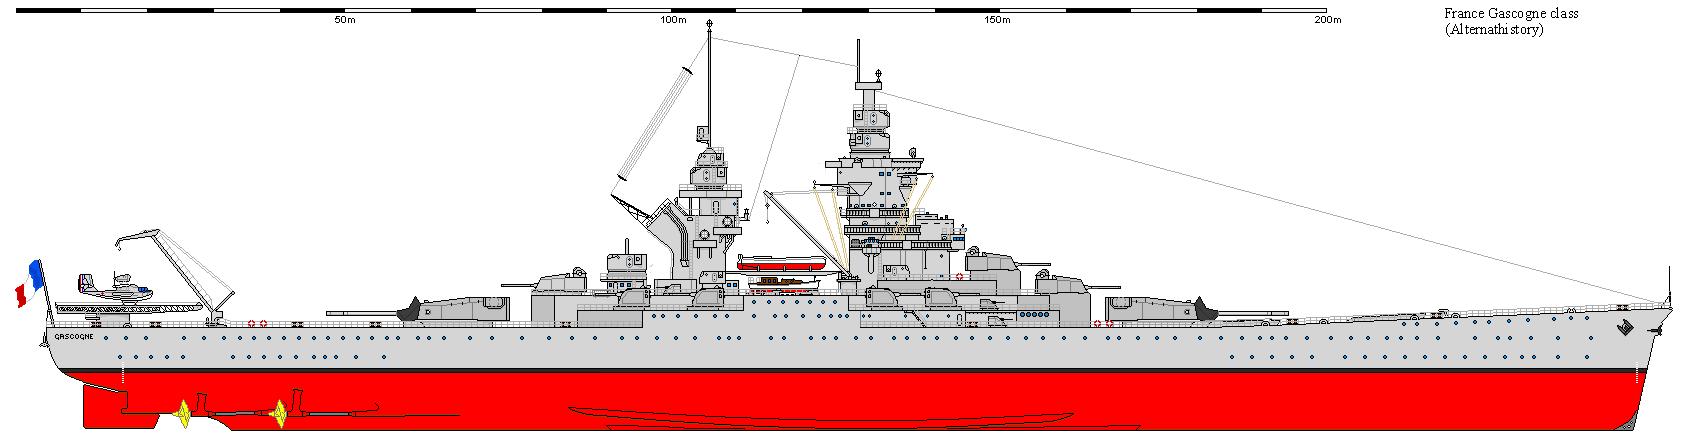 Warship - Gascogne - Battleship